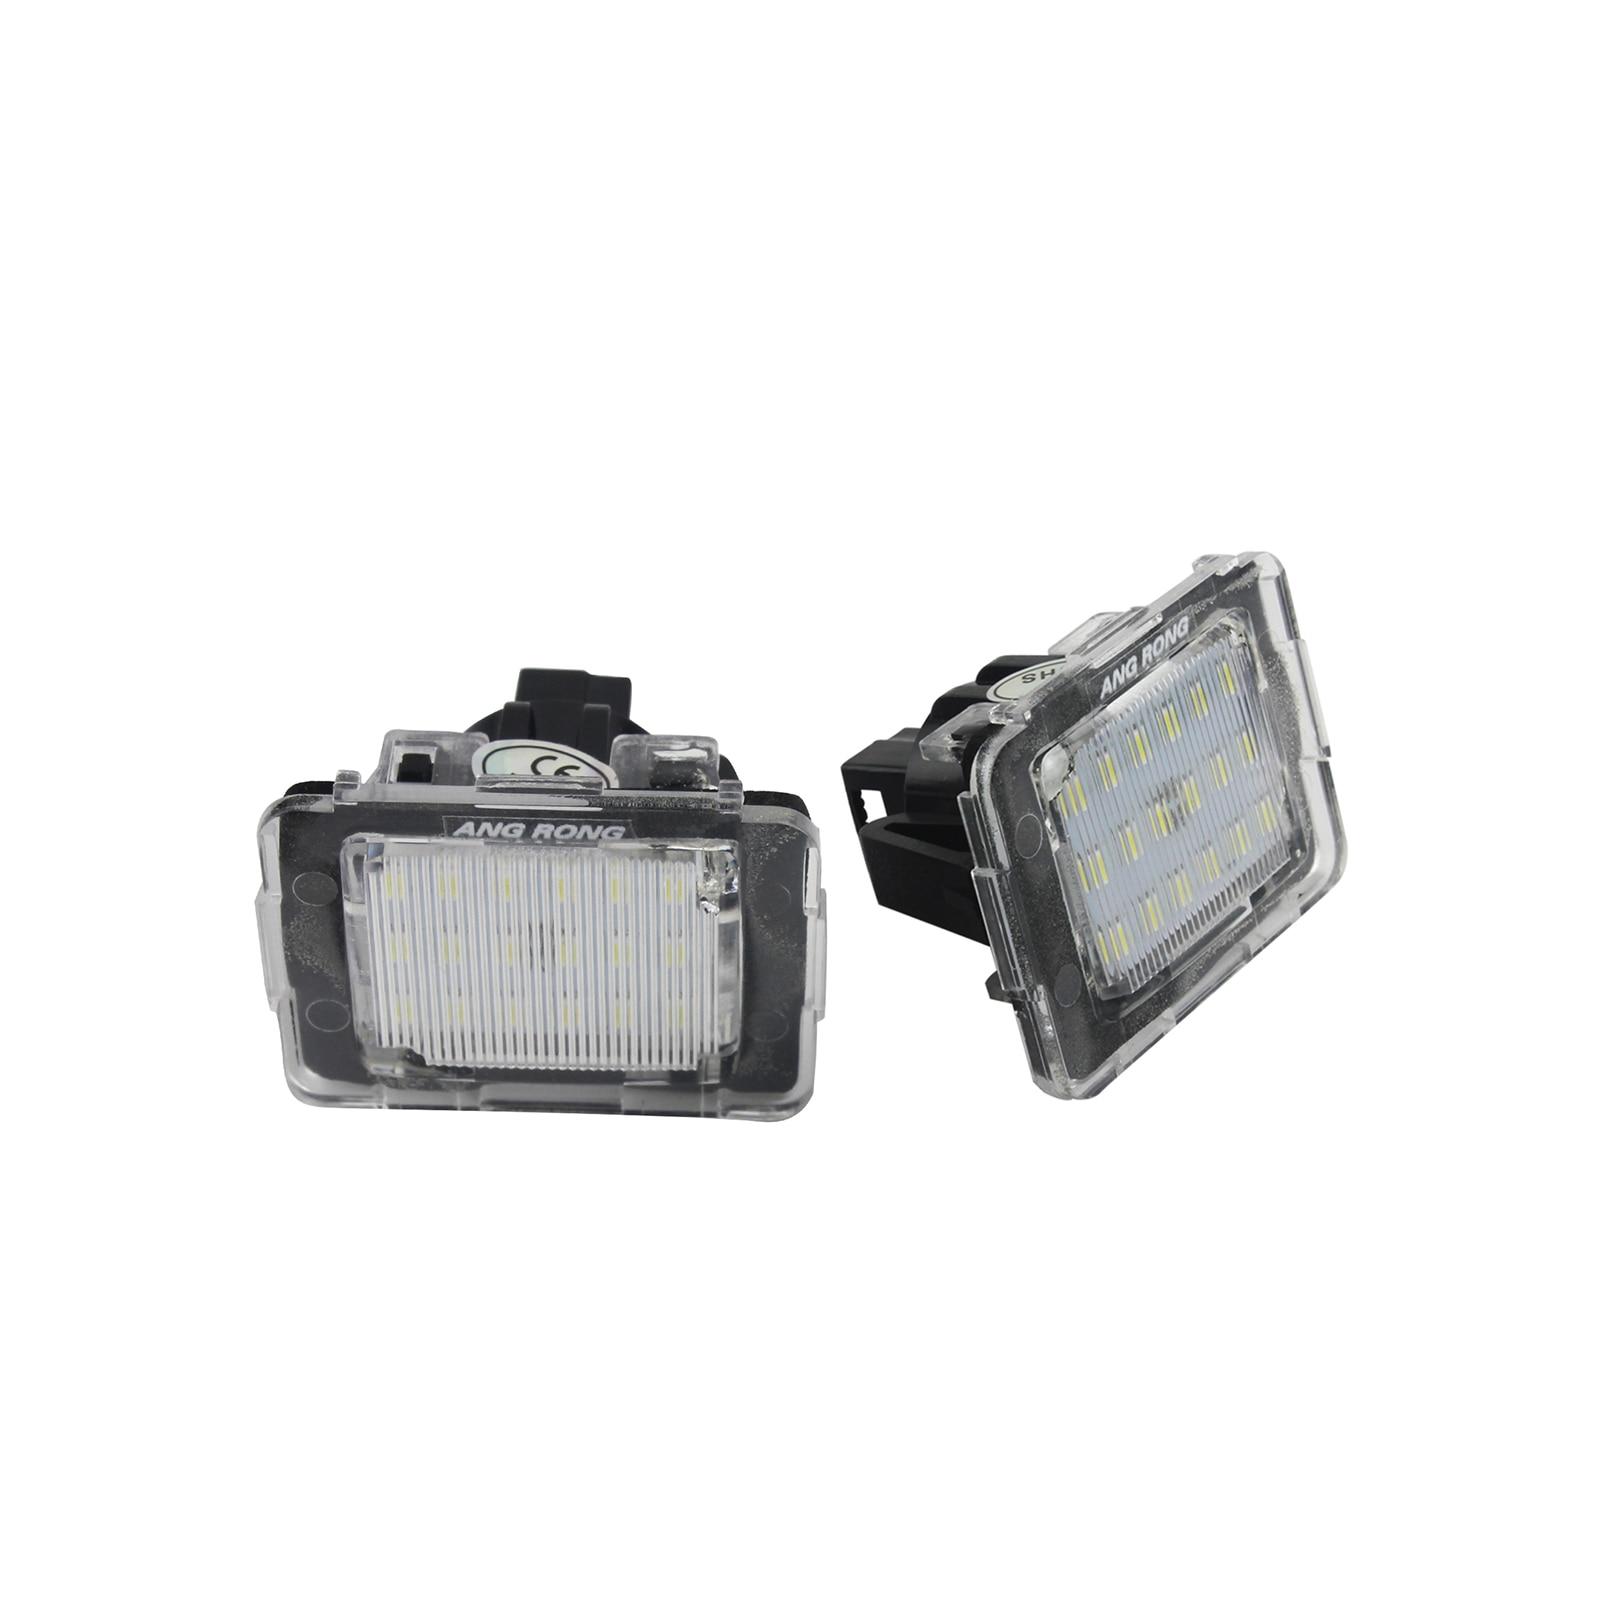 NEW GENUINE MERCEDES BENZ MB SLK CLASS R172 LICENSE PLATE LIGHT LAMP 1PCS